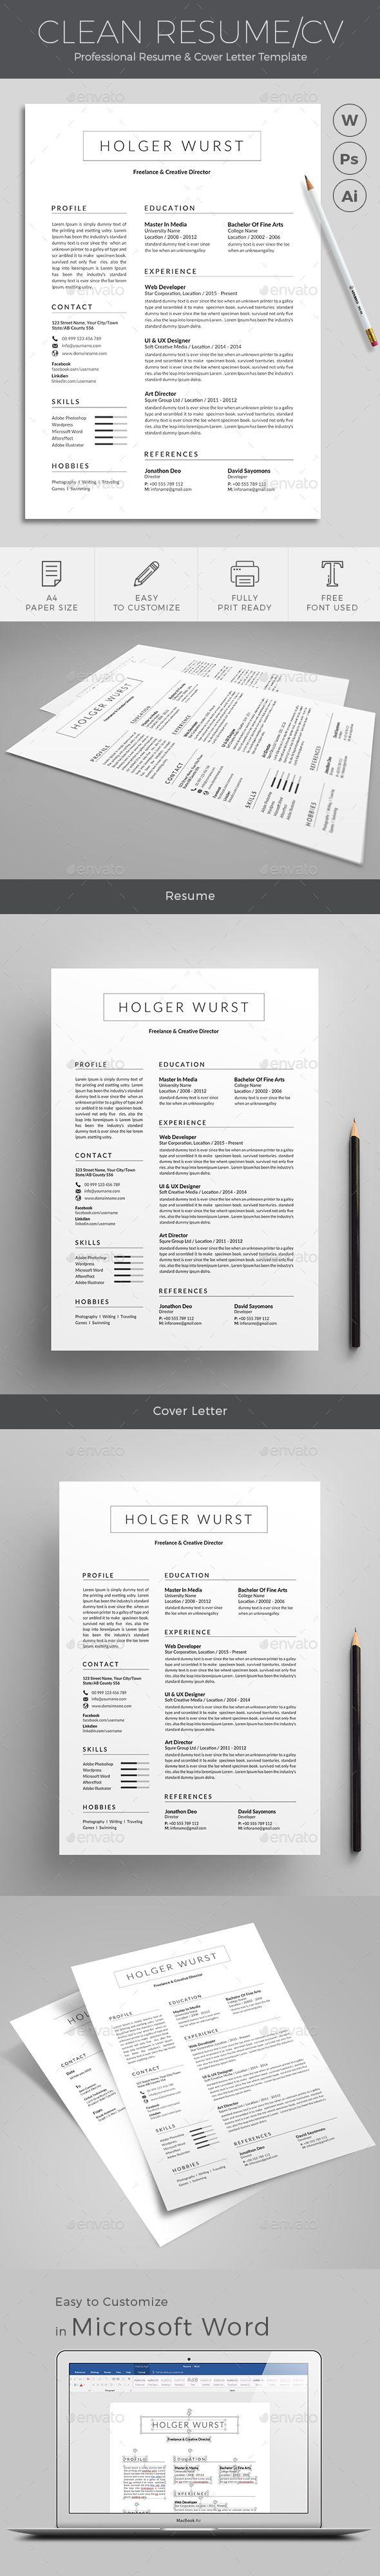 Standard Font Size For Resume Resume  Pinterest  Cv Template Template And Modern Resume